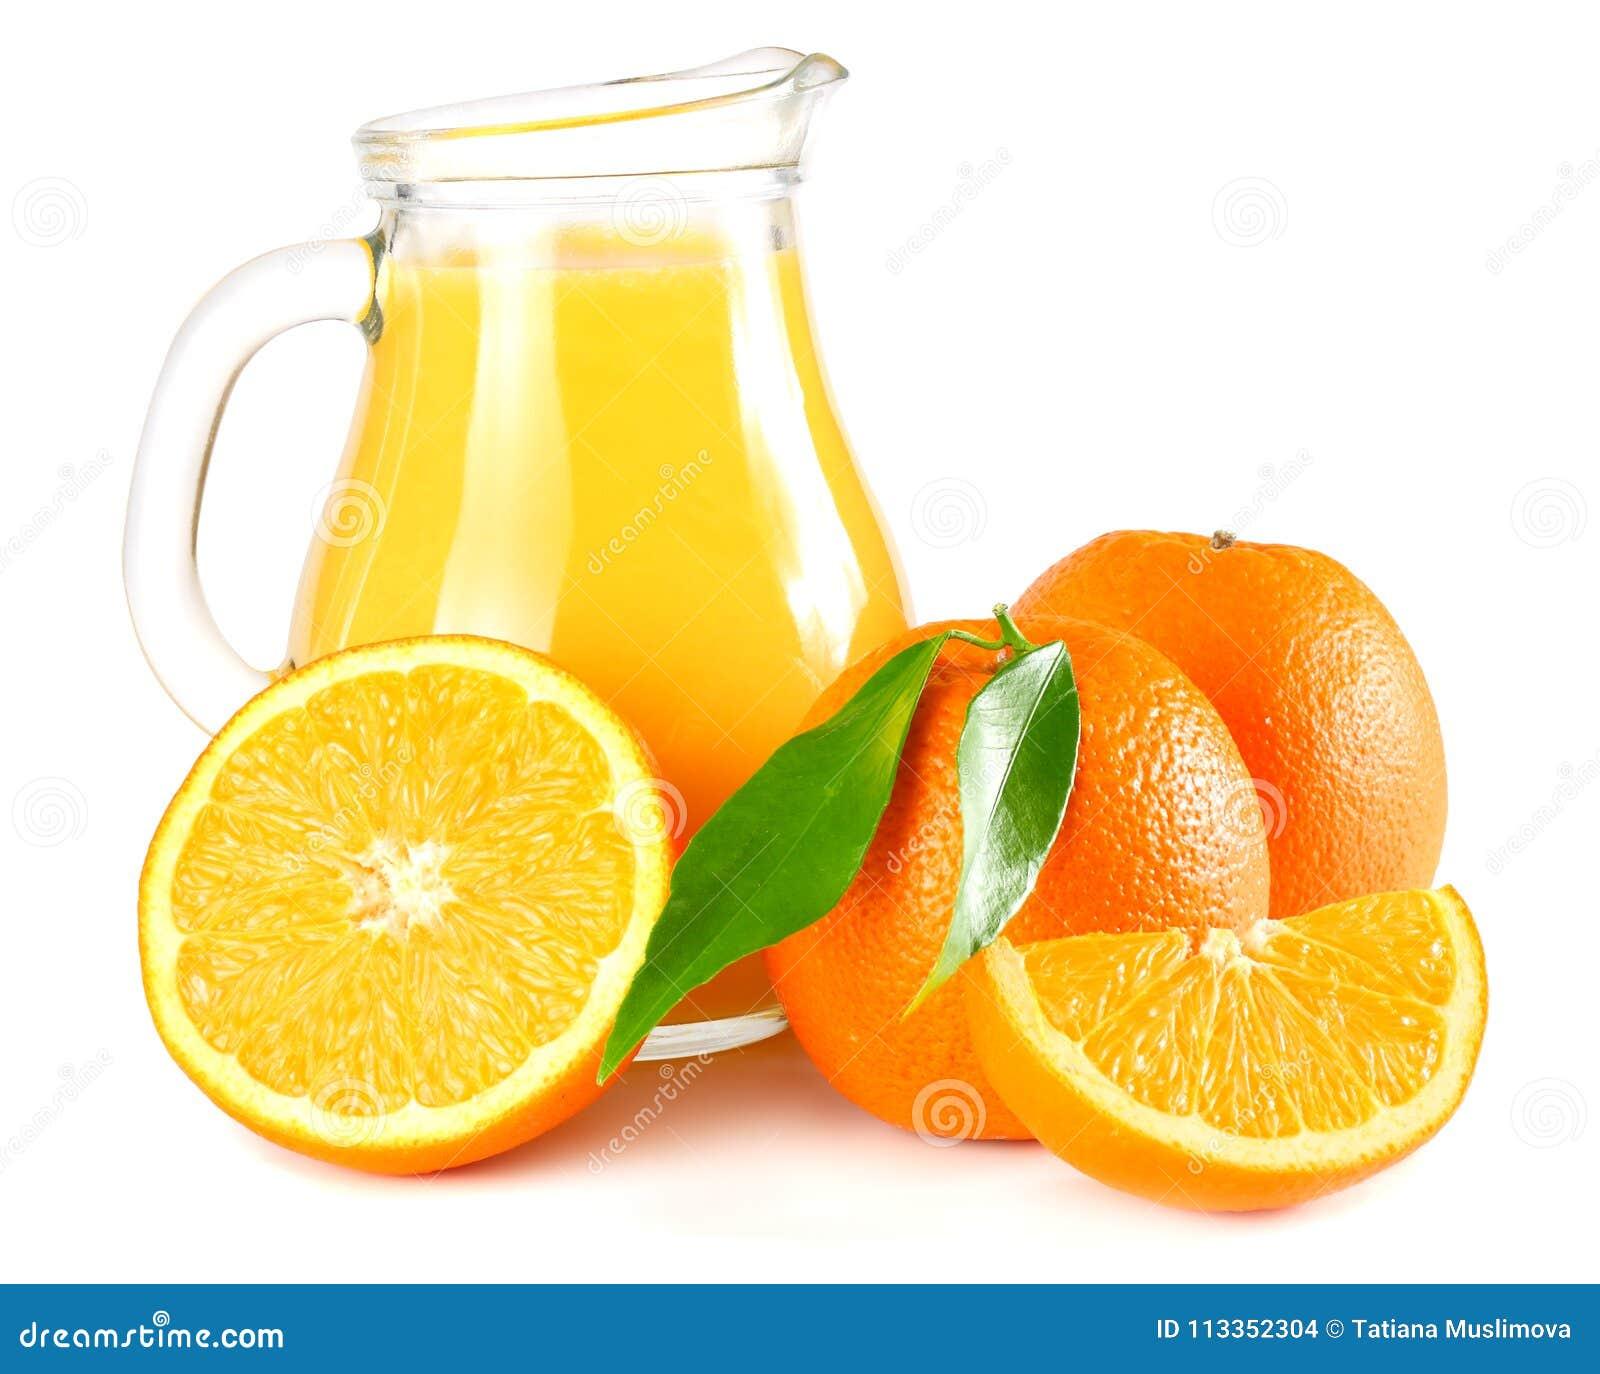 orange juice with orange and green leaf isolated on white background. juice in jug